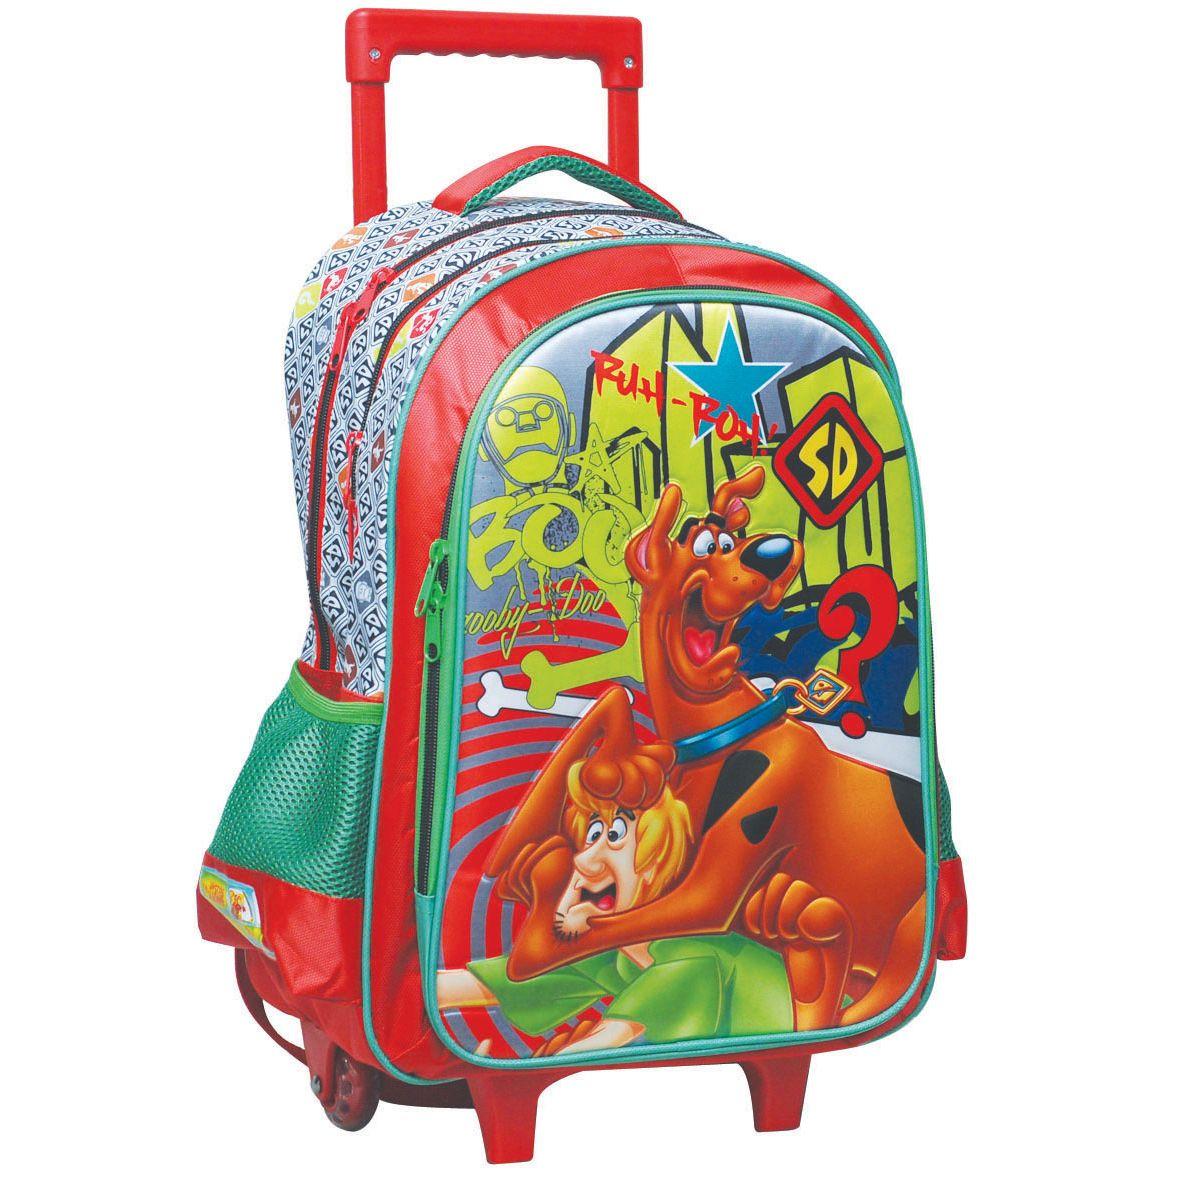 65855a4800 Τσάντα Δημοτικου Trolley Scooby Doo Boo 336-11074